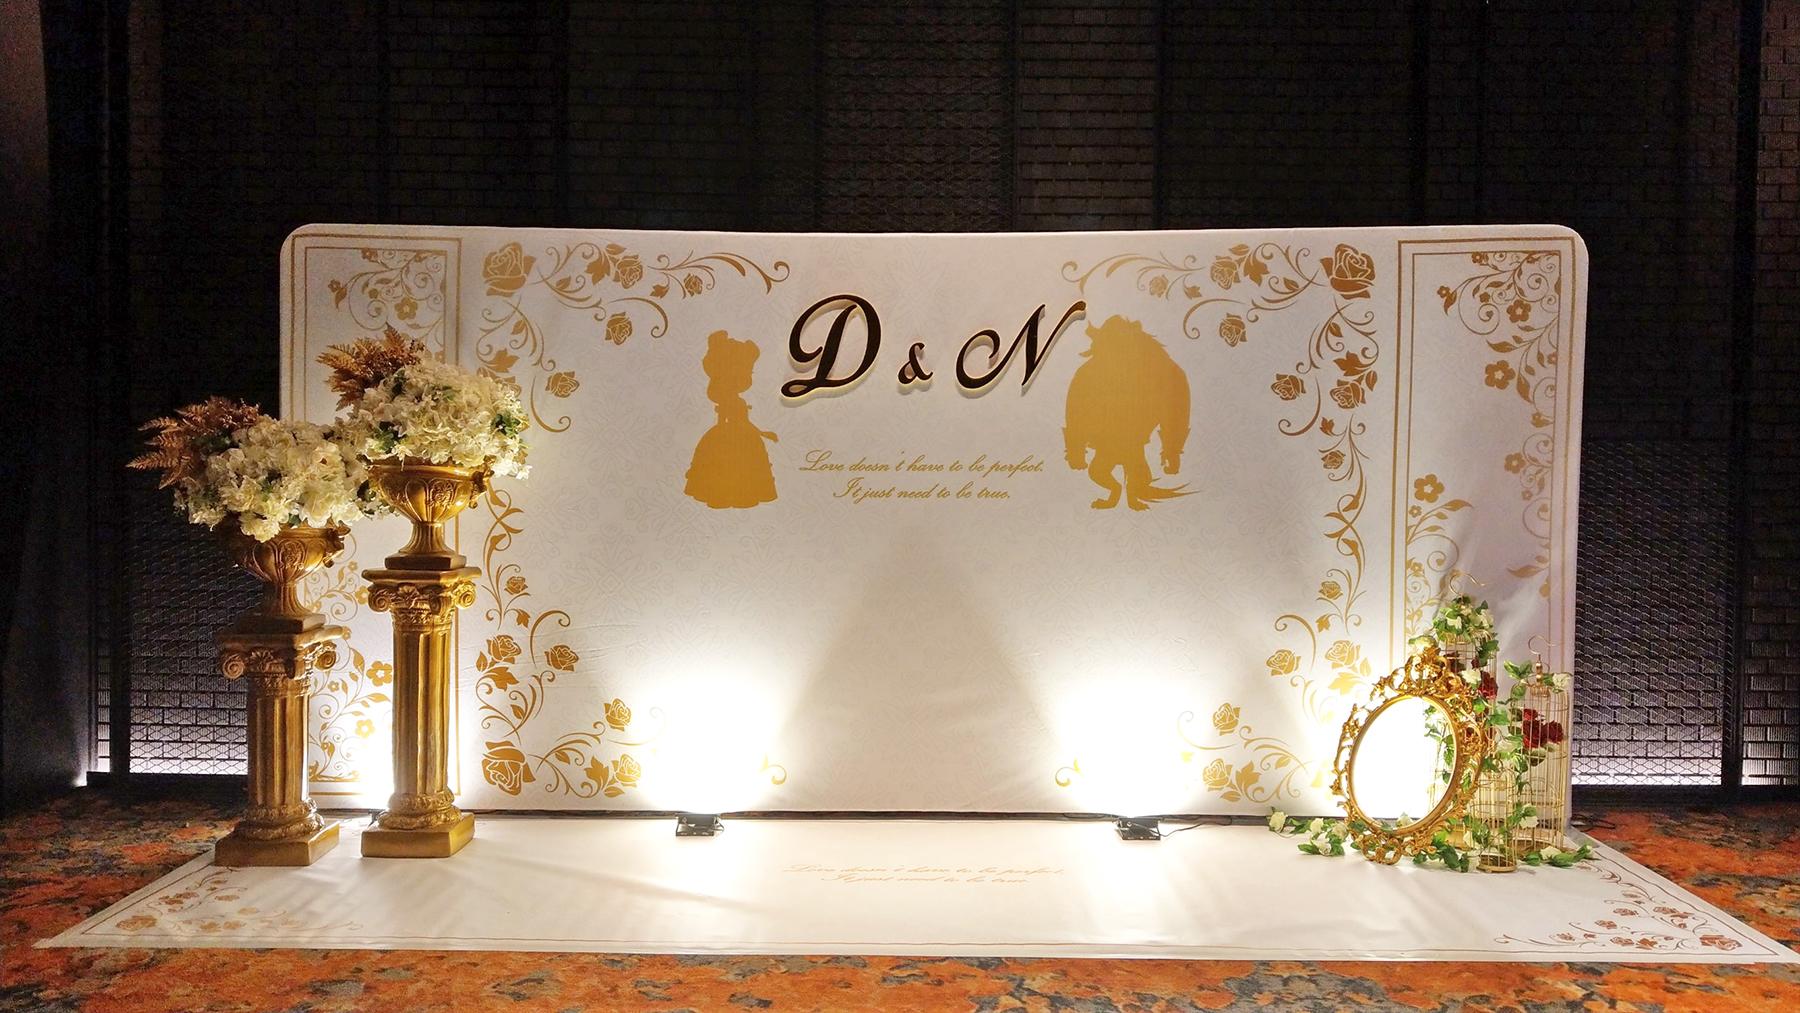 Urs主題婚禮佈置 / 客製婚禮小物 |  - 美女與野獸<br>婚禮佈置